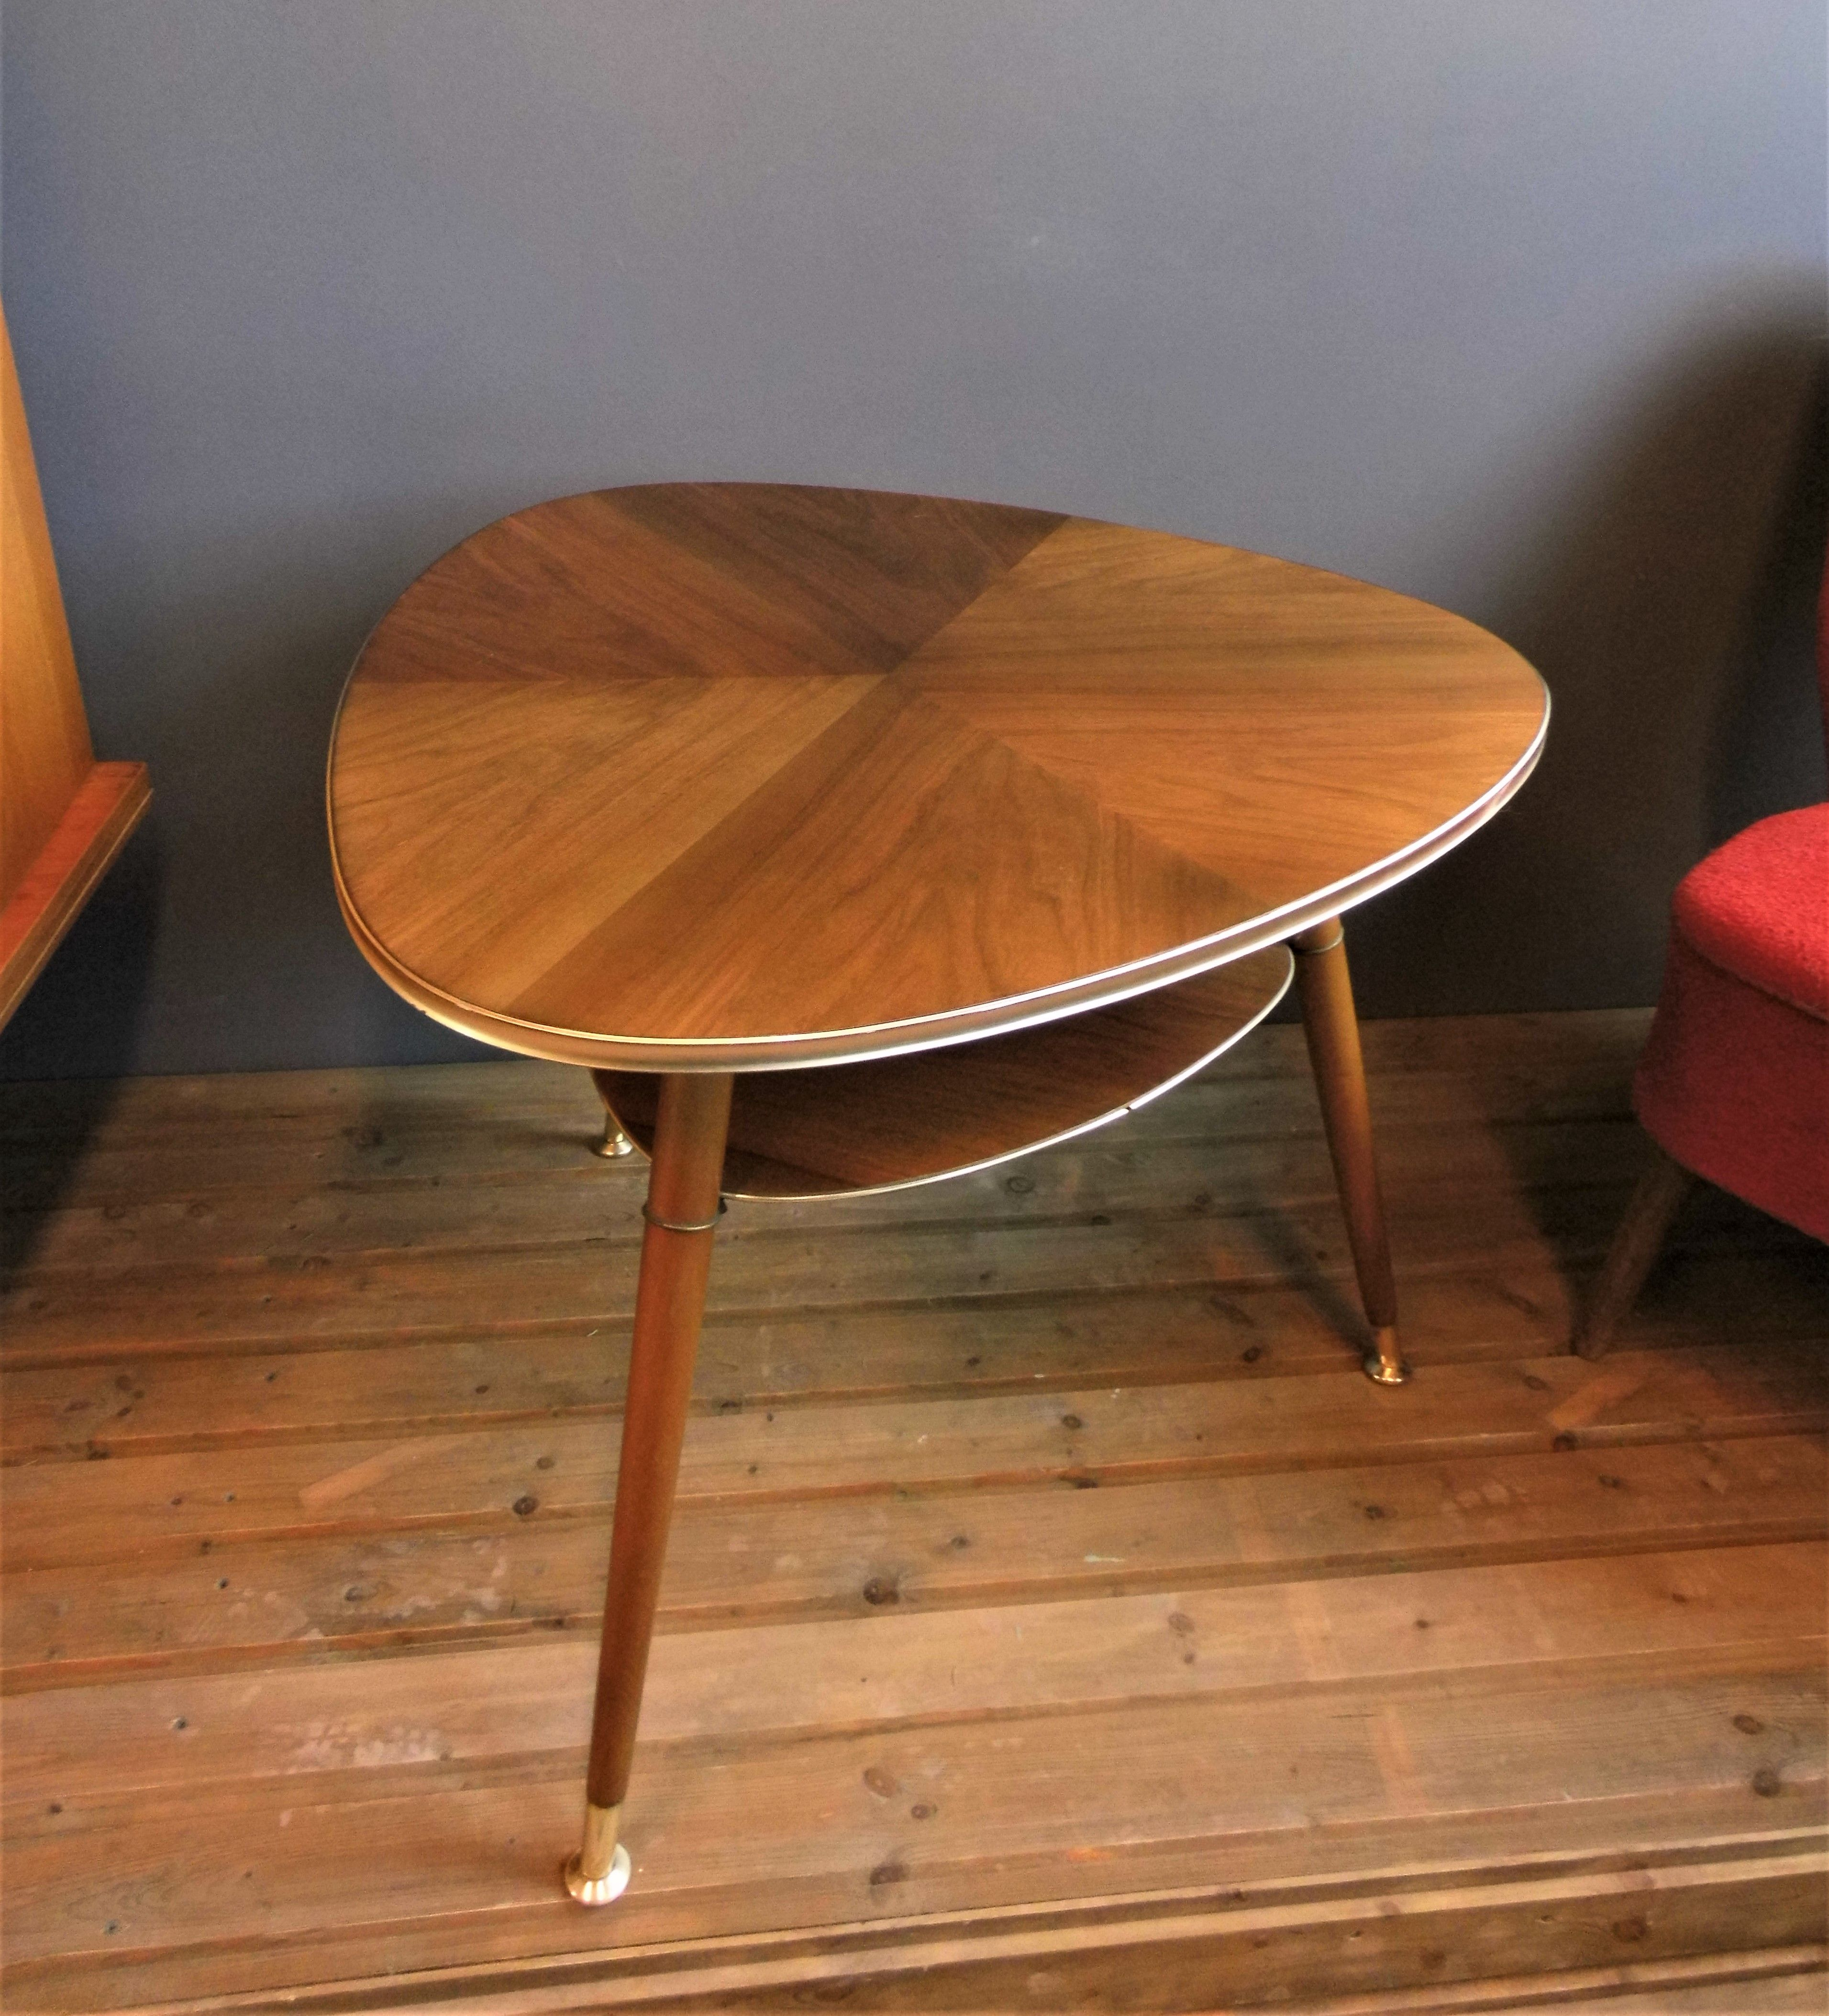 Super Noble Kidney Table Triangle Table Side Table Coffeetable Original 50s 50s Tripod Living Room Table Mid Century Modern Table Wohnzimmertische Nierentisch Wohnzimmertisch